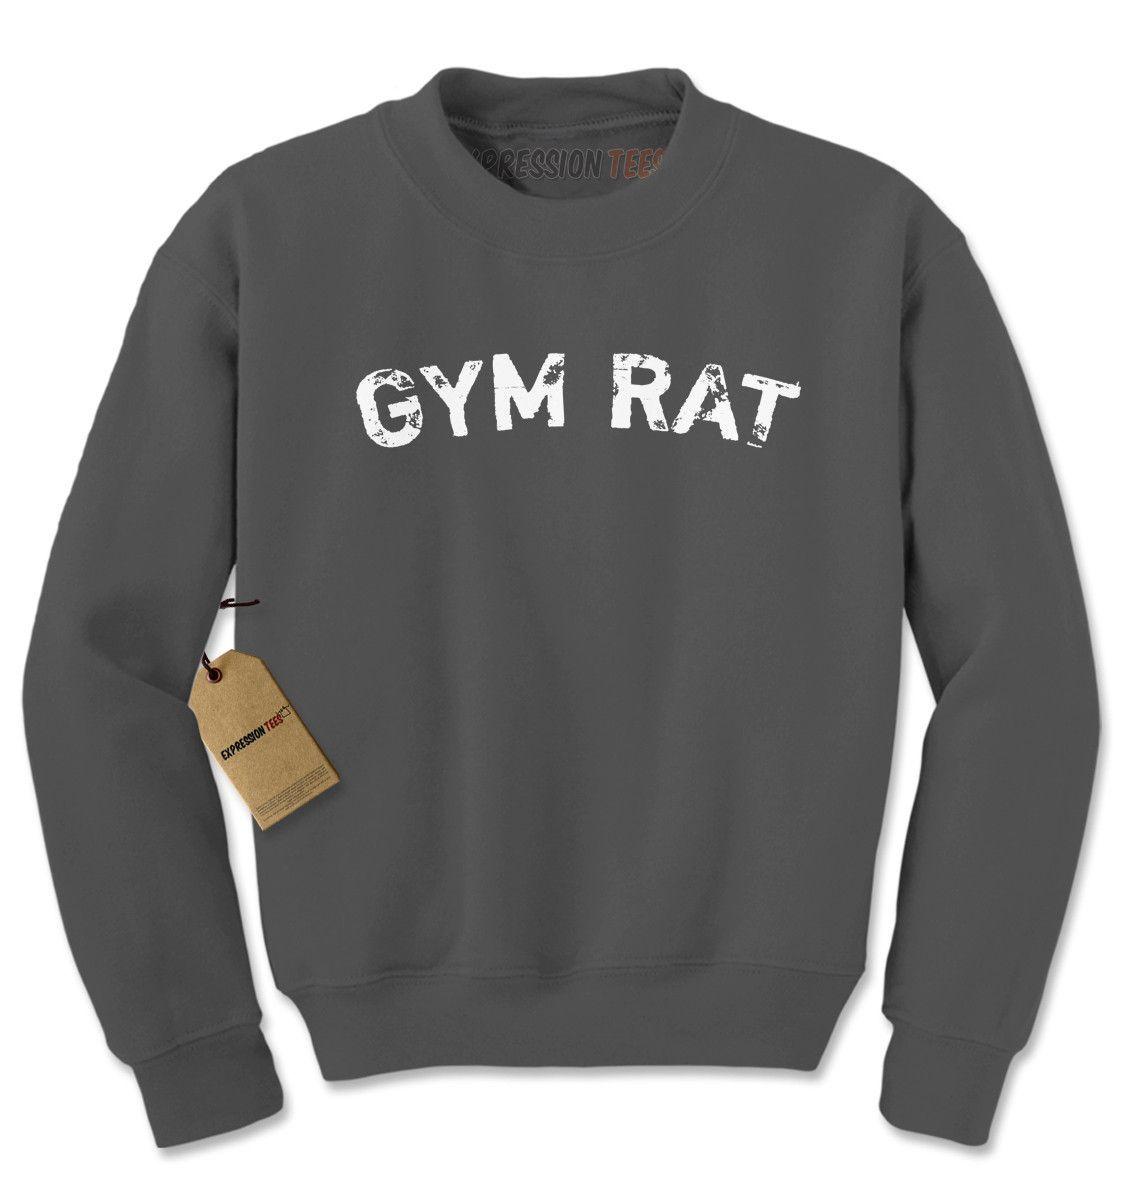 Gym Rat Workout Adult Crewneck Sweatshirt